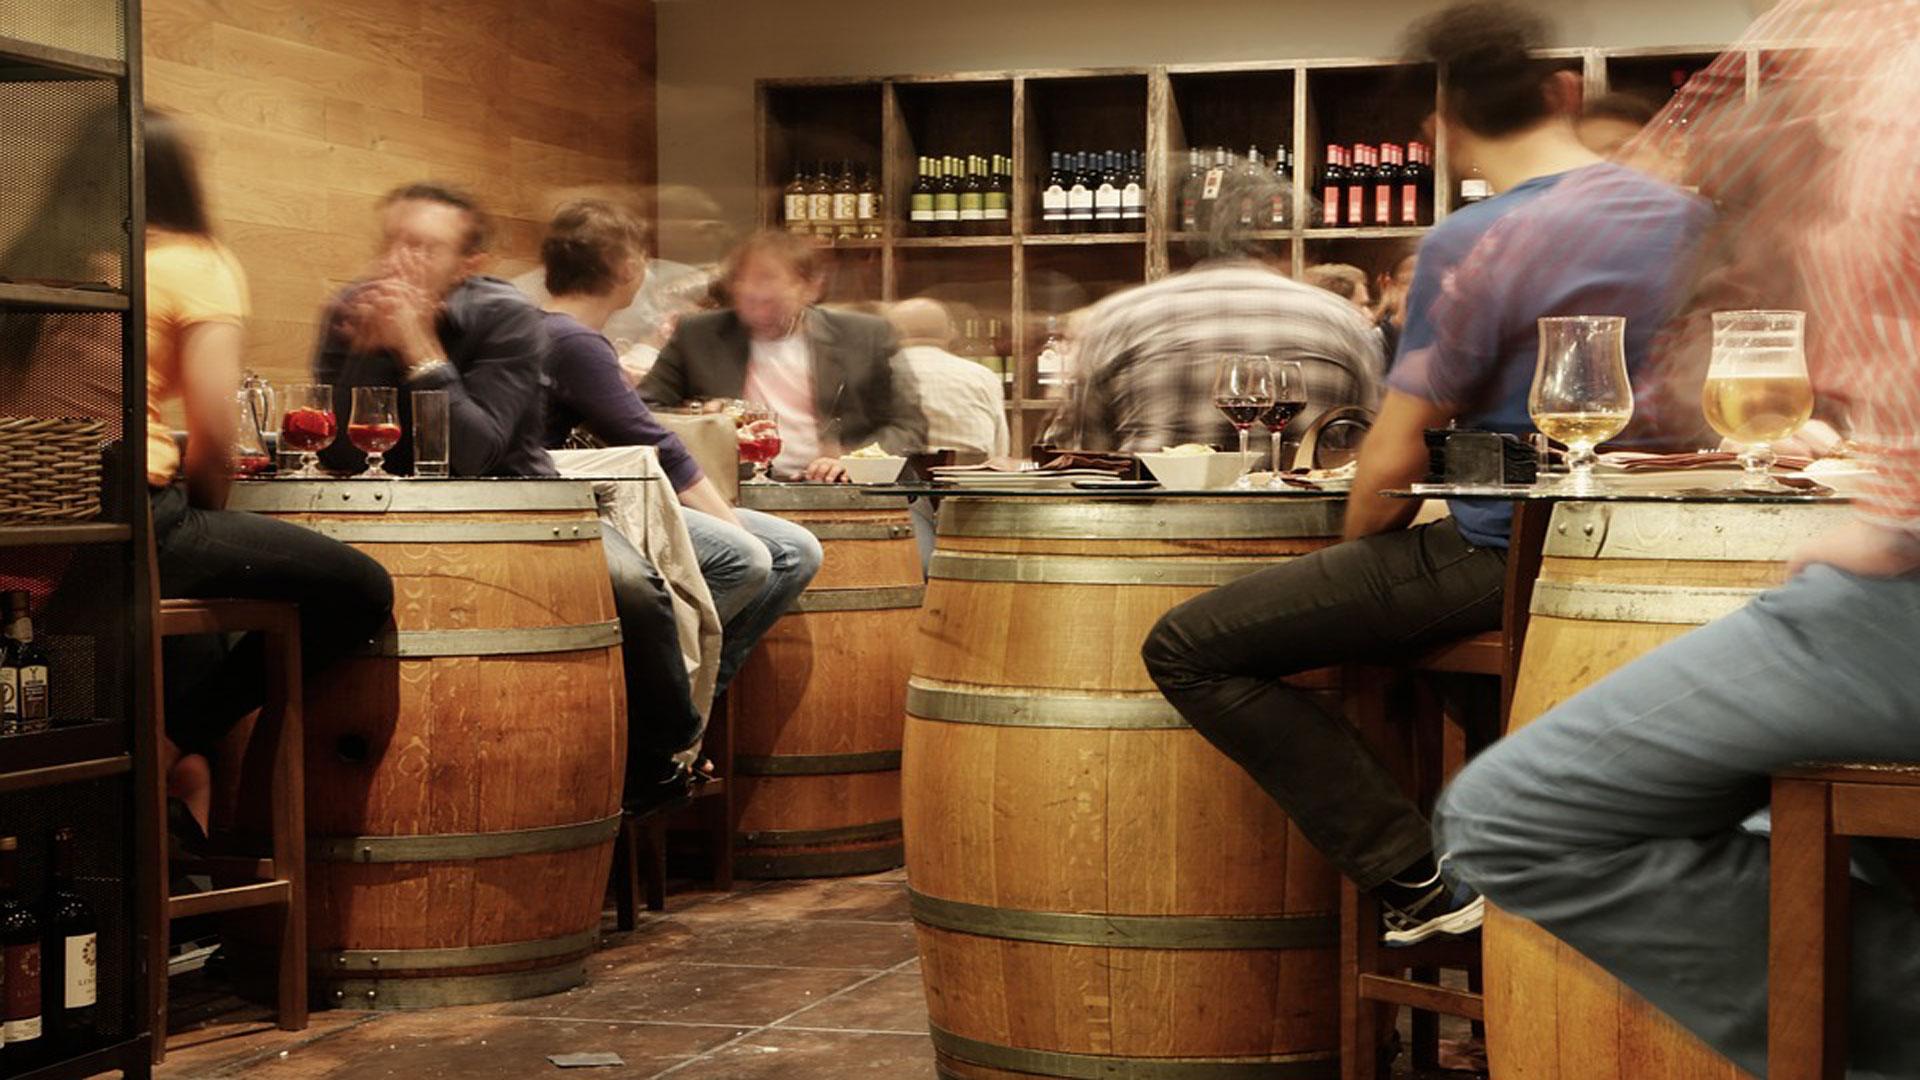 10-curiosidades-sobre-la-cerveza-1920-jpg